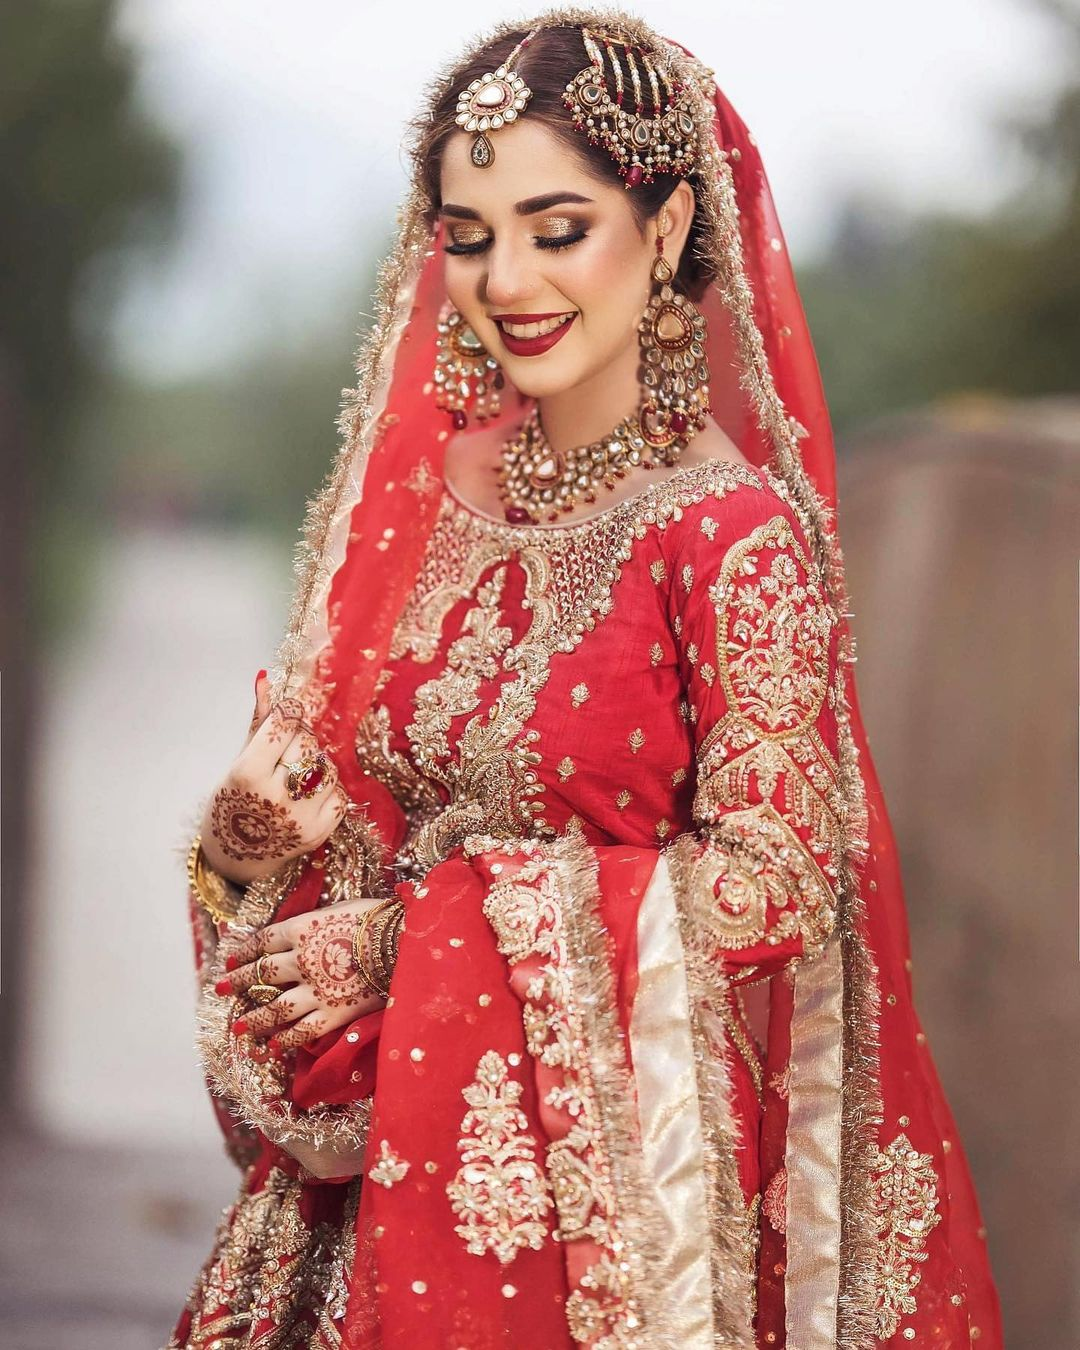 Bride DP in Red Dress